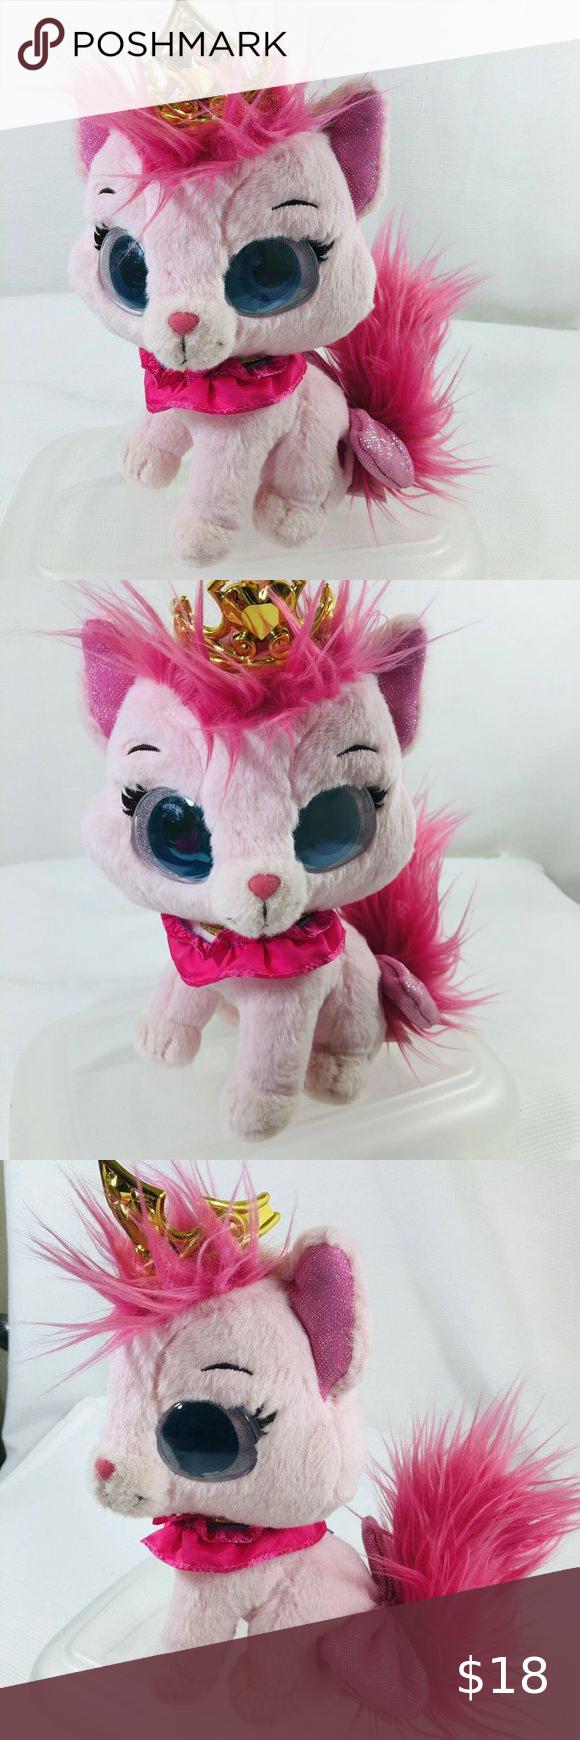 Disney Princess Palace Pets Bright Eyes Aurora In 2020 Princess Palace Pets Disney Princess Palace Pets Palace Pets